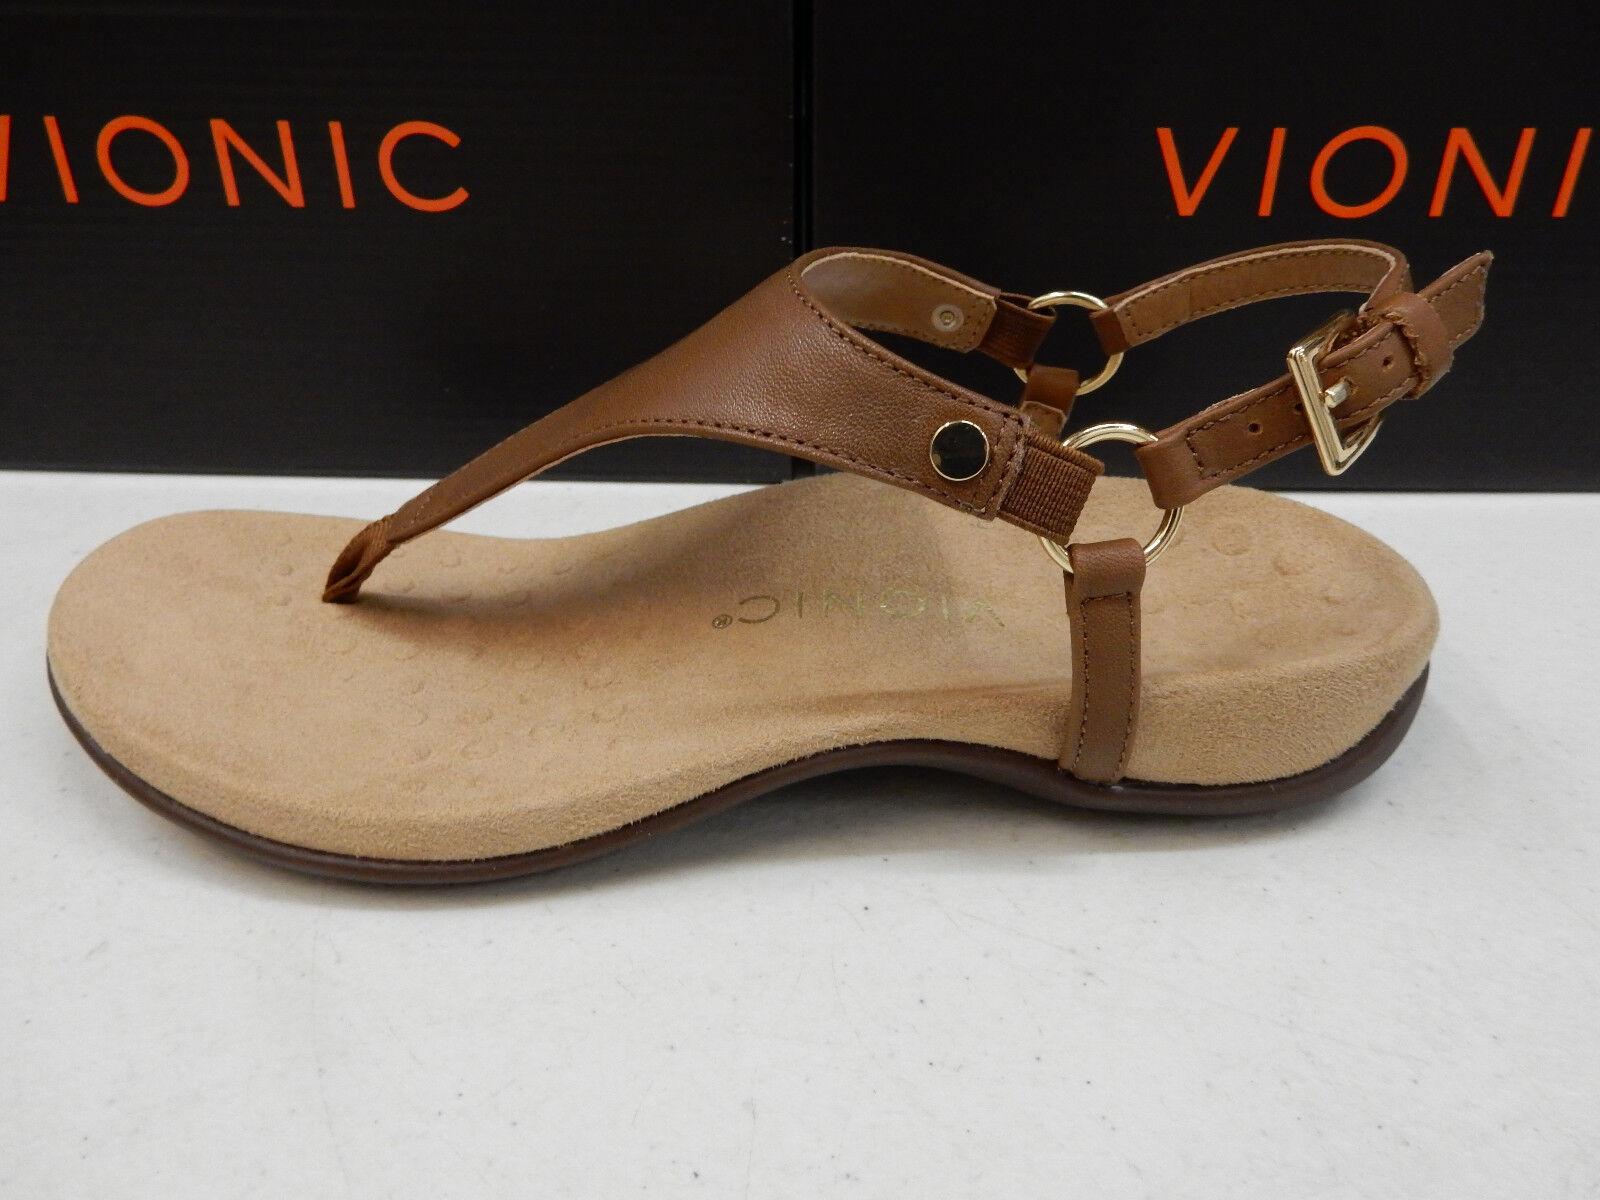 e38994fcc9e2 Vionic Womens Sandals Kirra Brown Size 6 for sale online